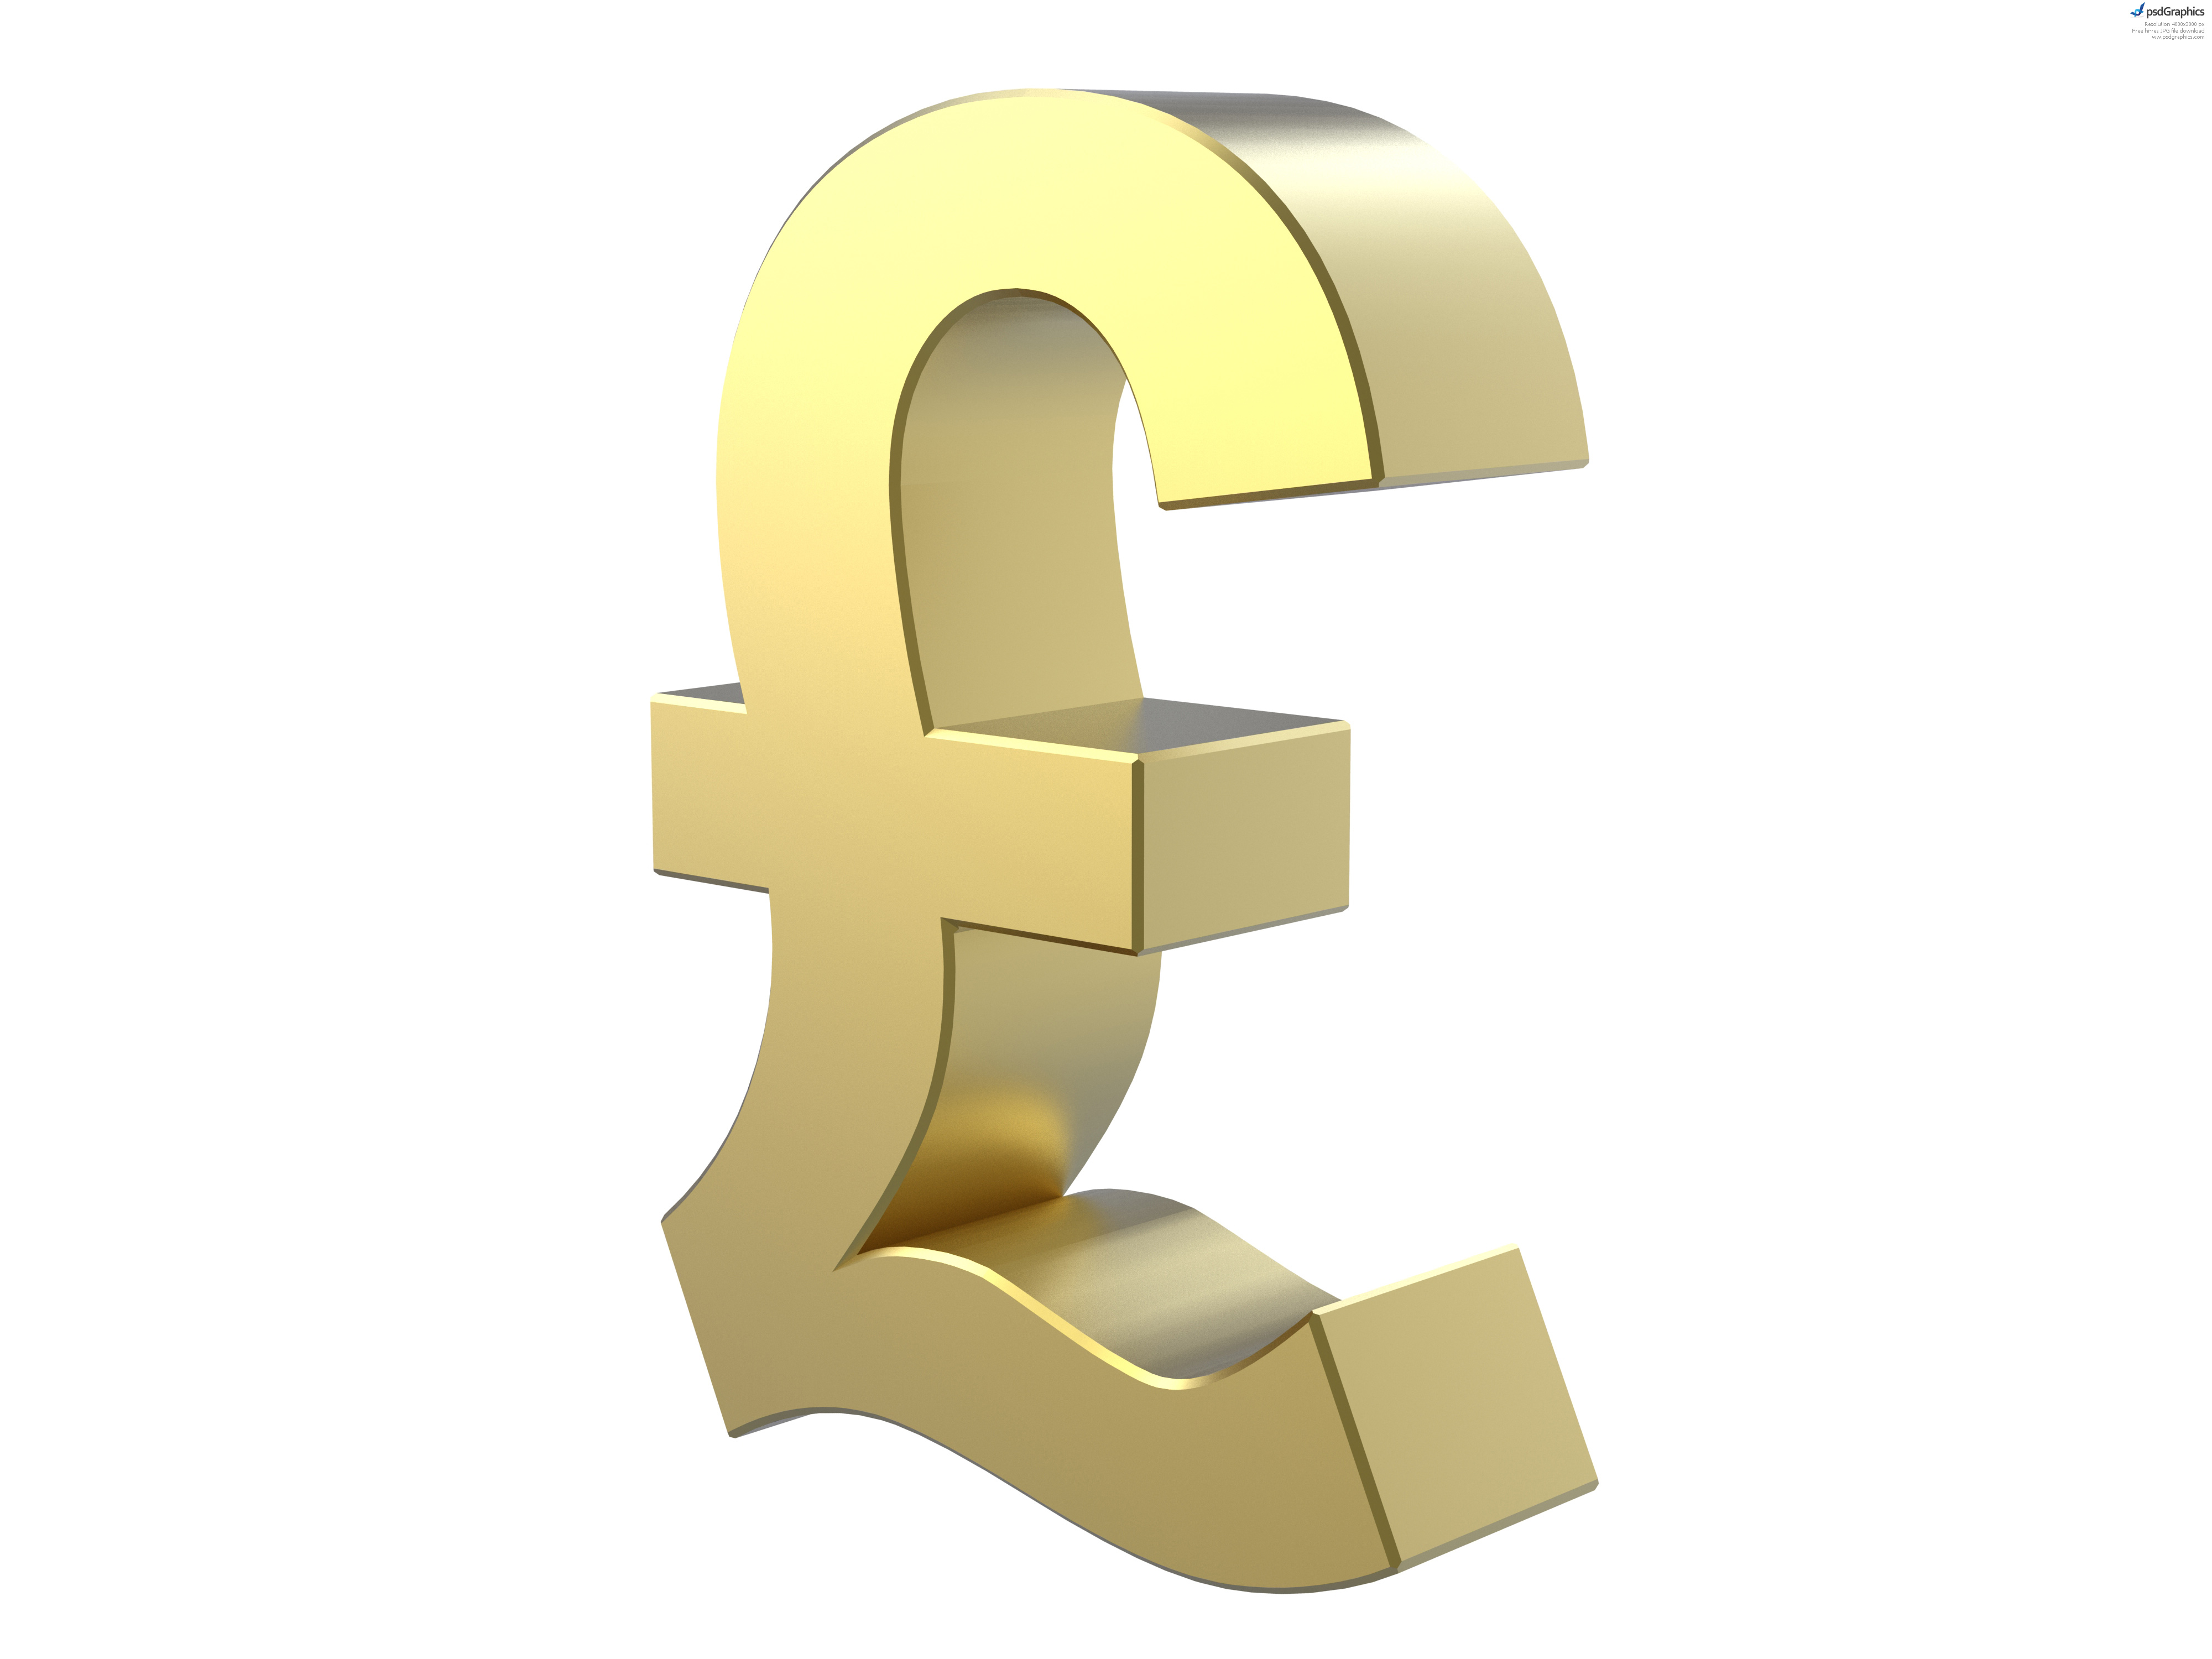 Изображение 3D золотого символа фунта стерлингов